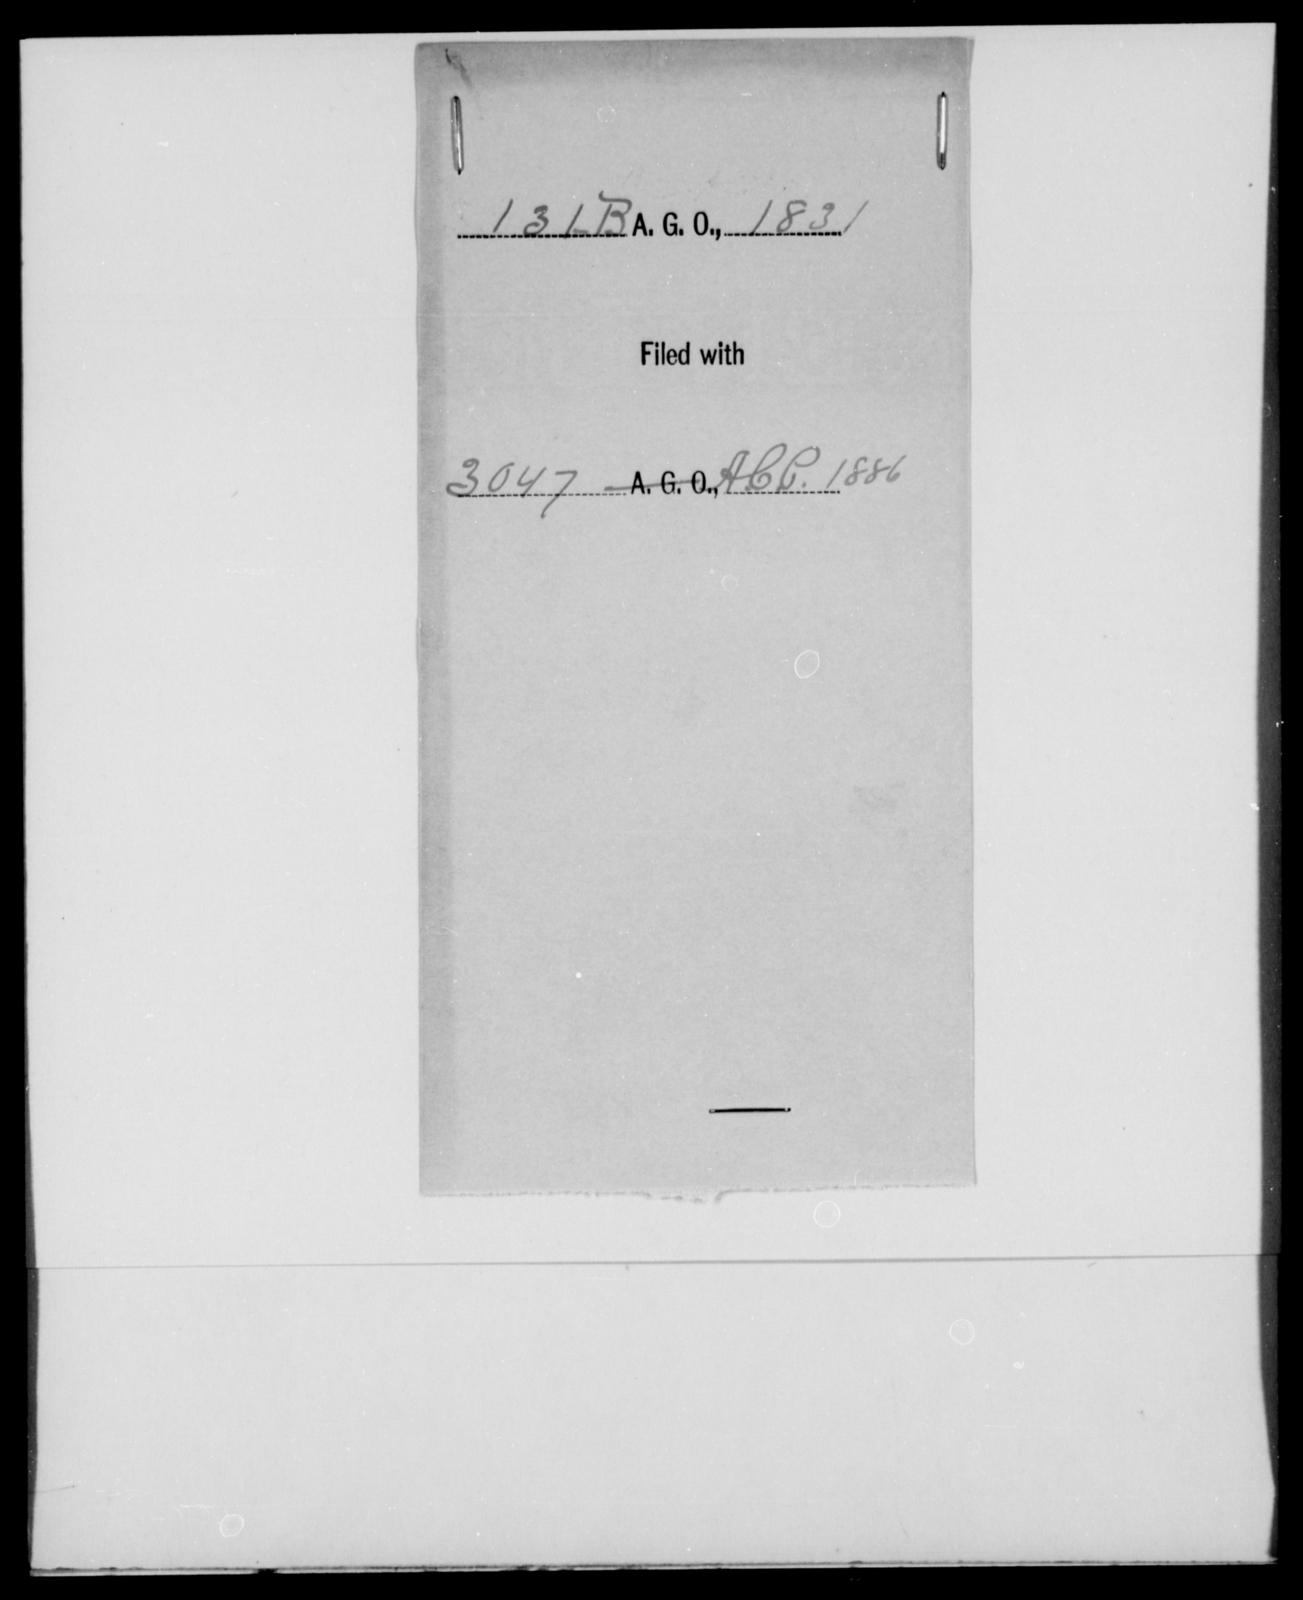 [Blank], [Blank] - State: [Blank] - Year: 1831 - File Number: B131